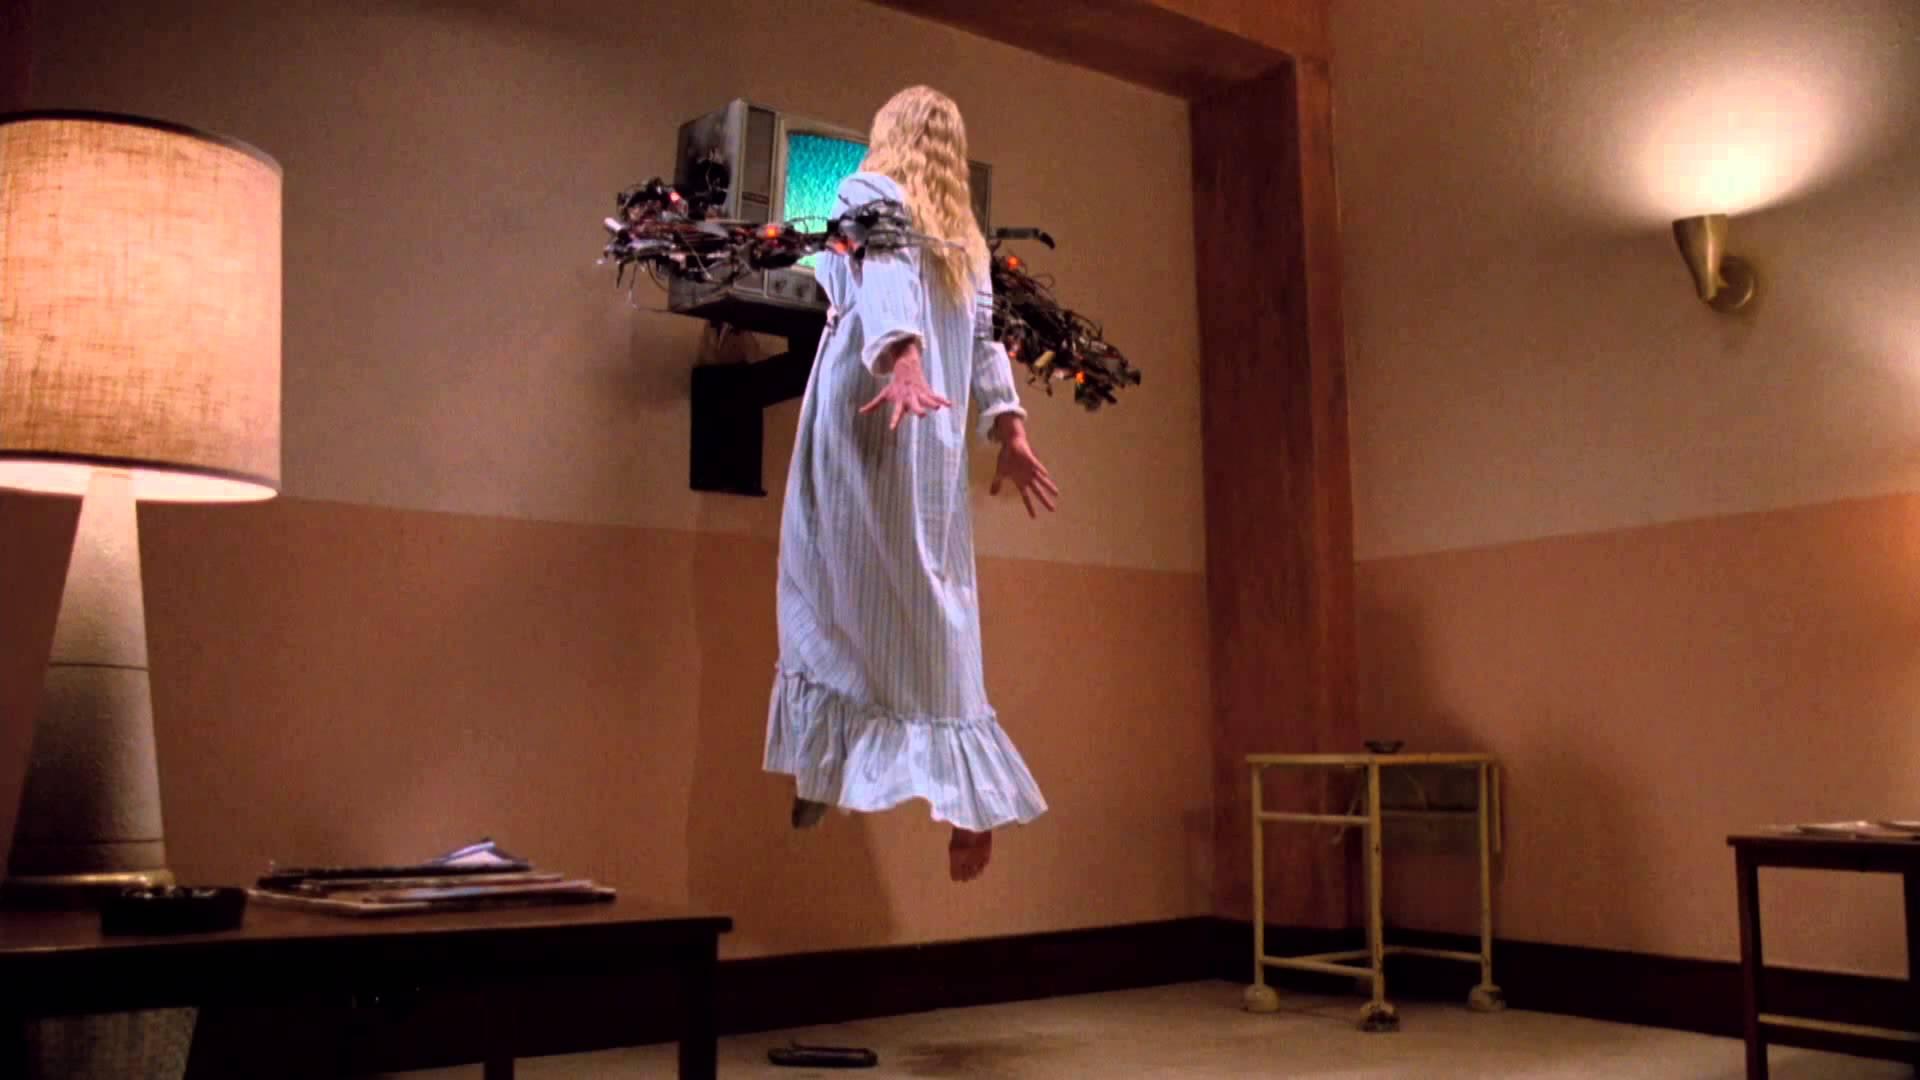 Nightmare on Elm Street 3 - Primetime, Bitch!